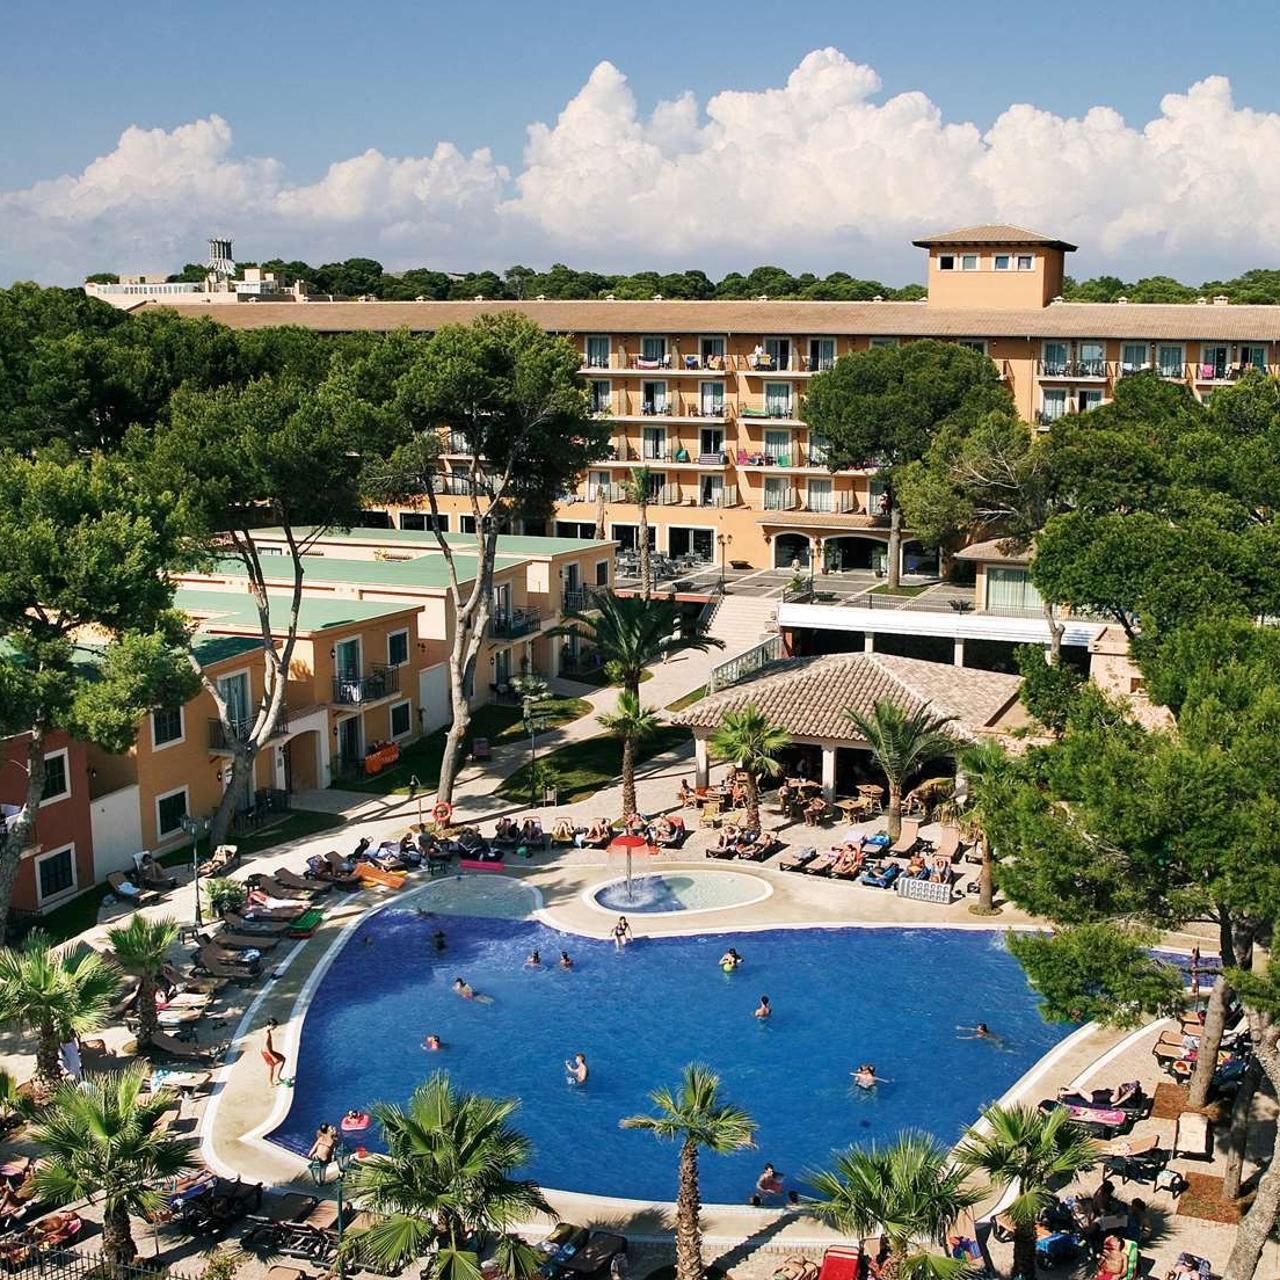 Hotel Occidental Playa De Palma Palma De Mallorca Balearic Islands At Hrs With Free Services